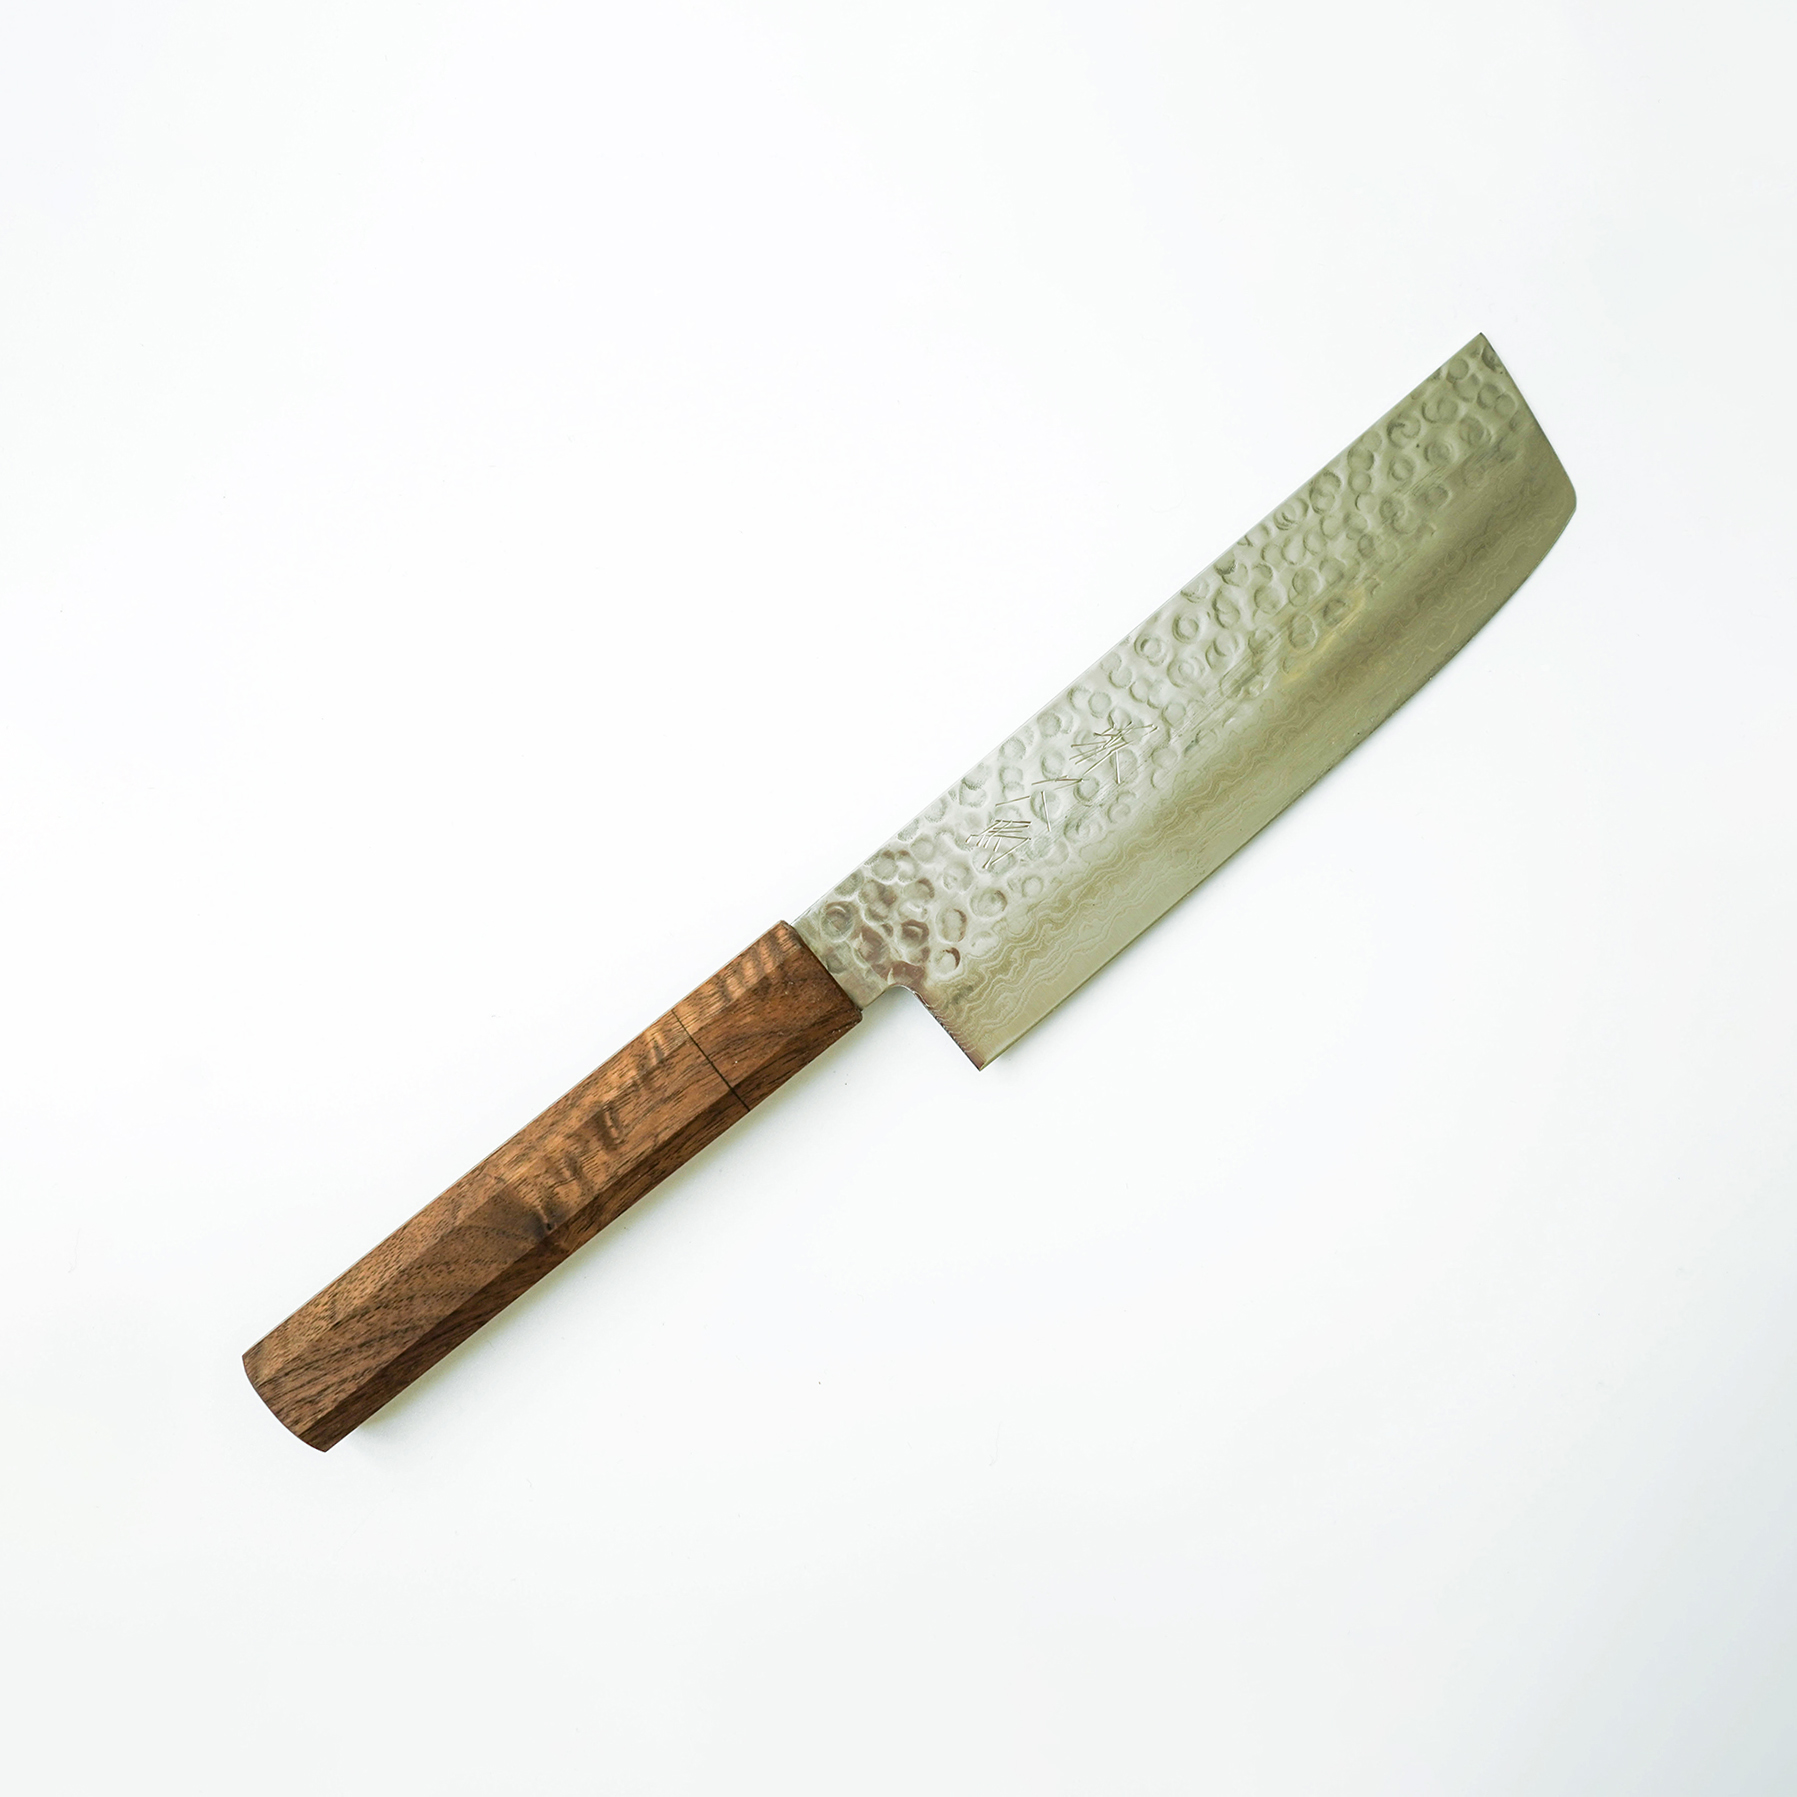 Signature Japanese Kitchen Knives by Sakai Kyuba - Nakiri Veggie Knife 160mm Brown